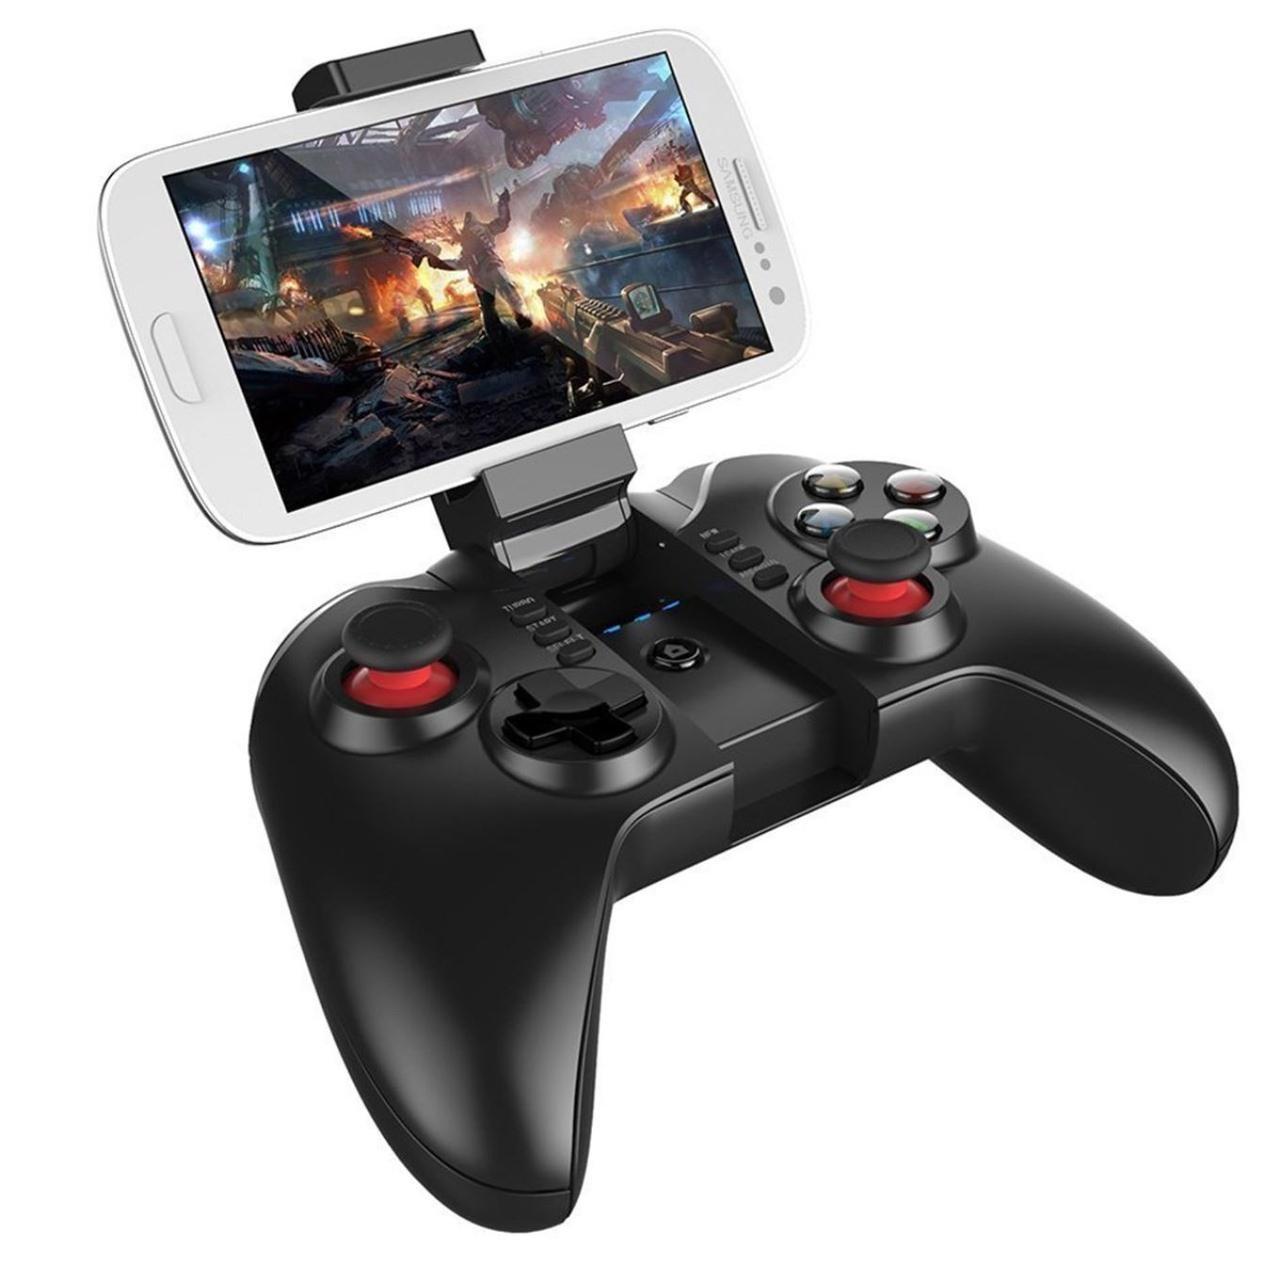 IPEGA PG-9068 Tomahawk Геймпад Джойстик Bluetooth для PC iOS Android - для PUBG, Fornite